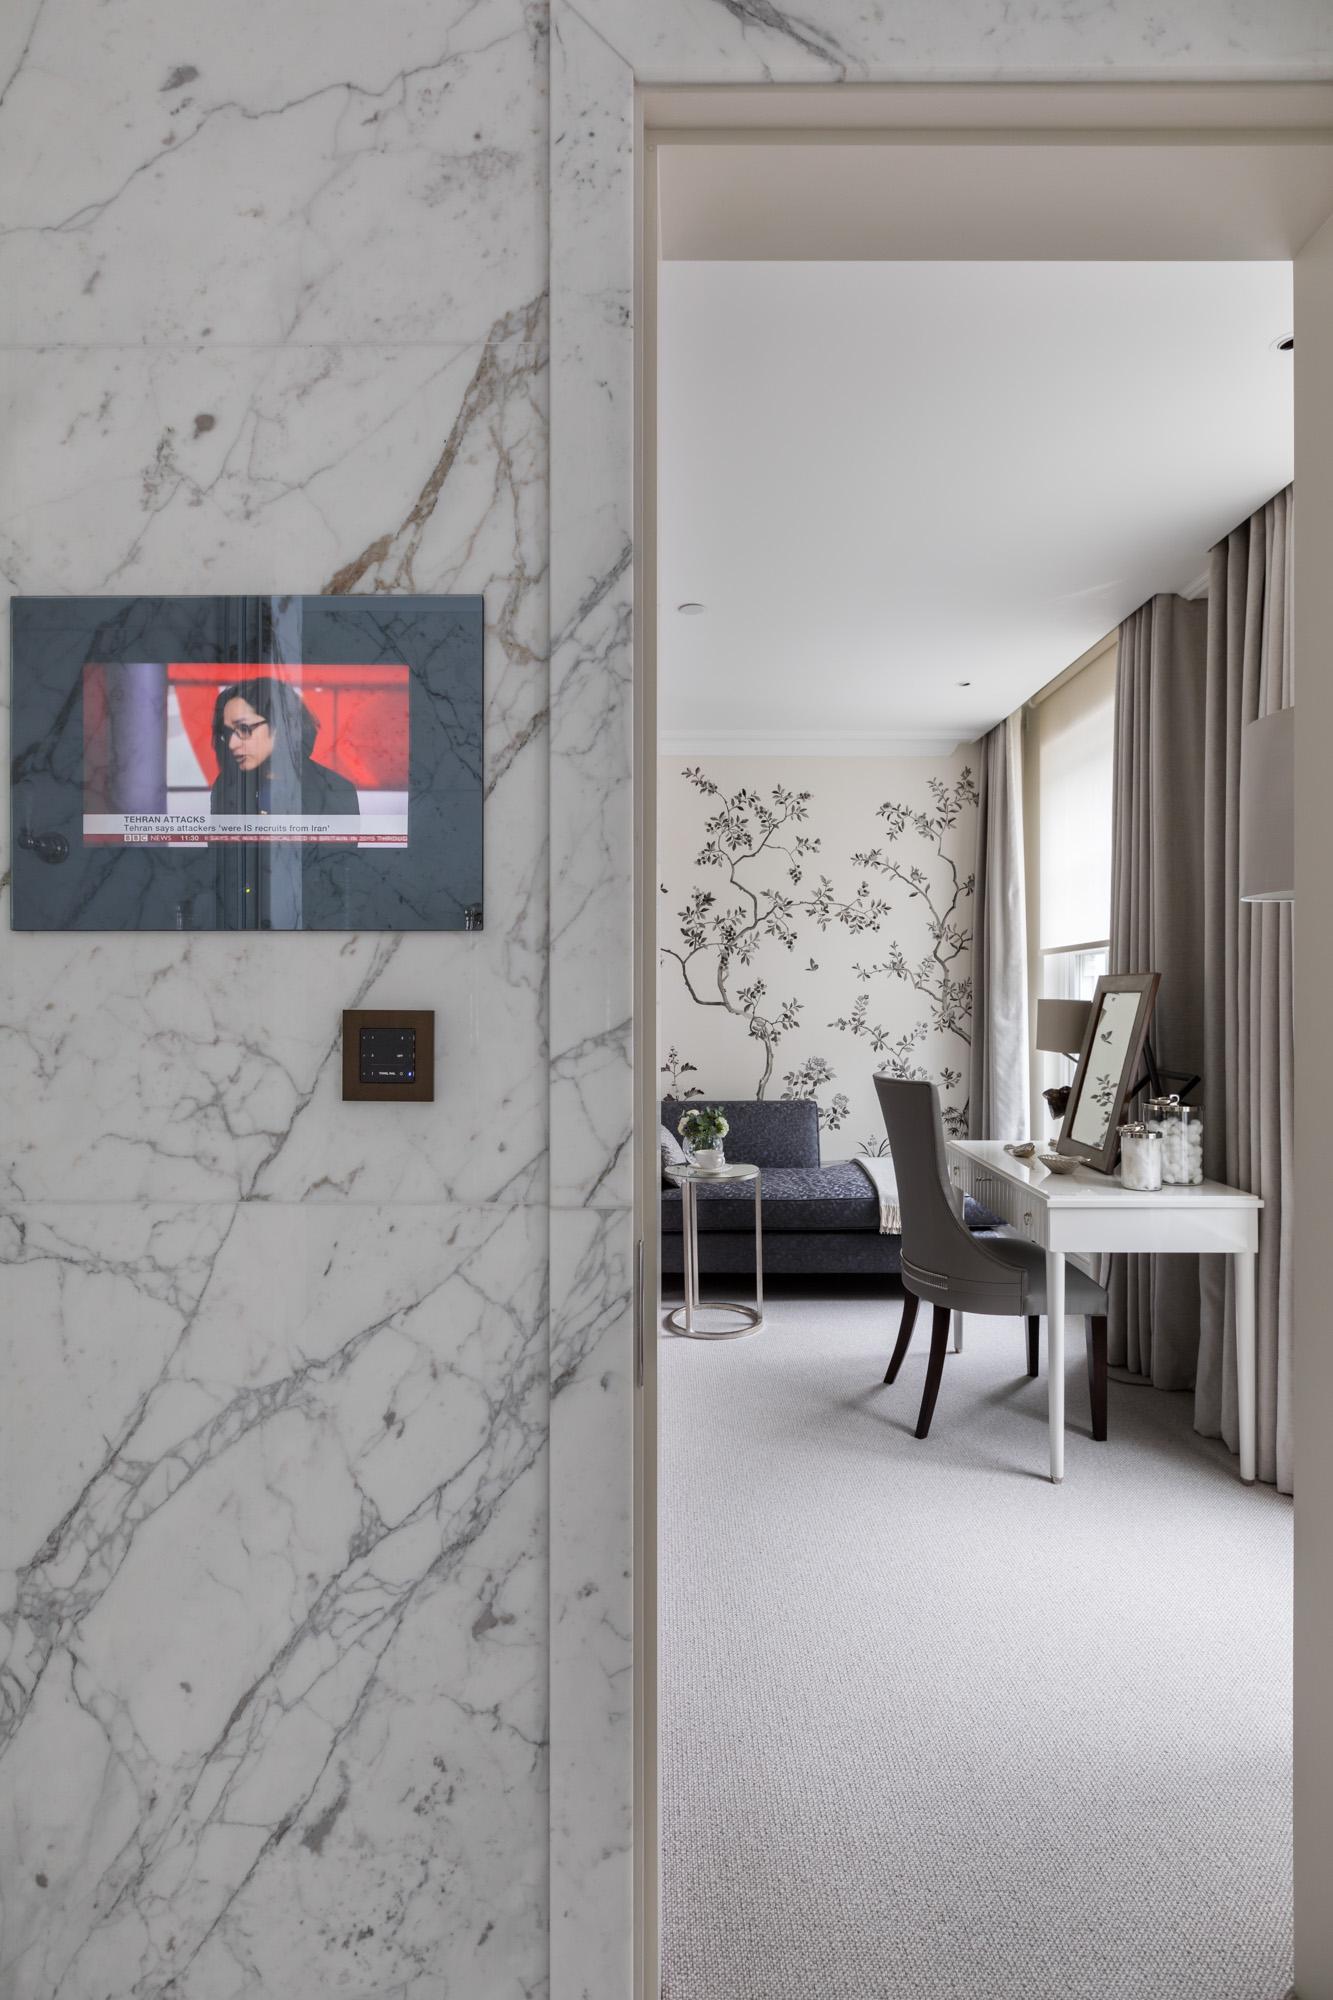 jonathan bond, interior photographer, hallway view of vanity desk, chelsea, london